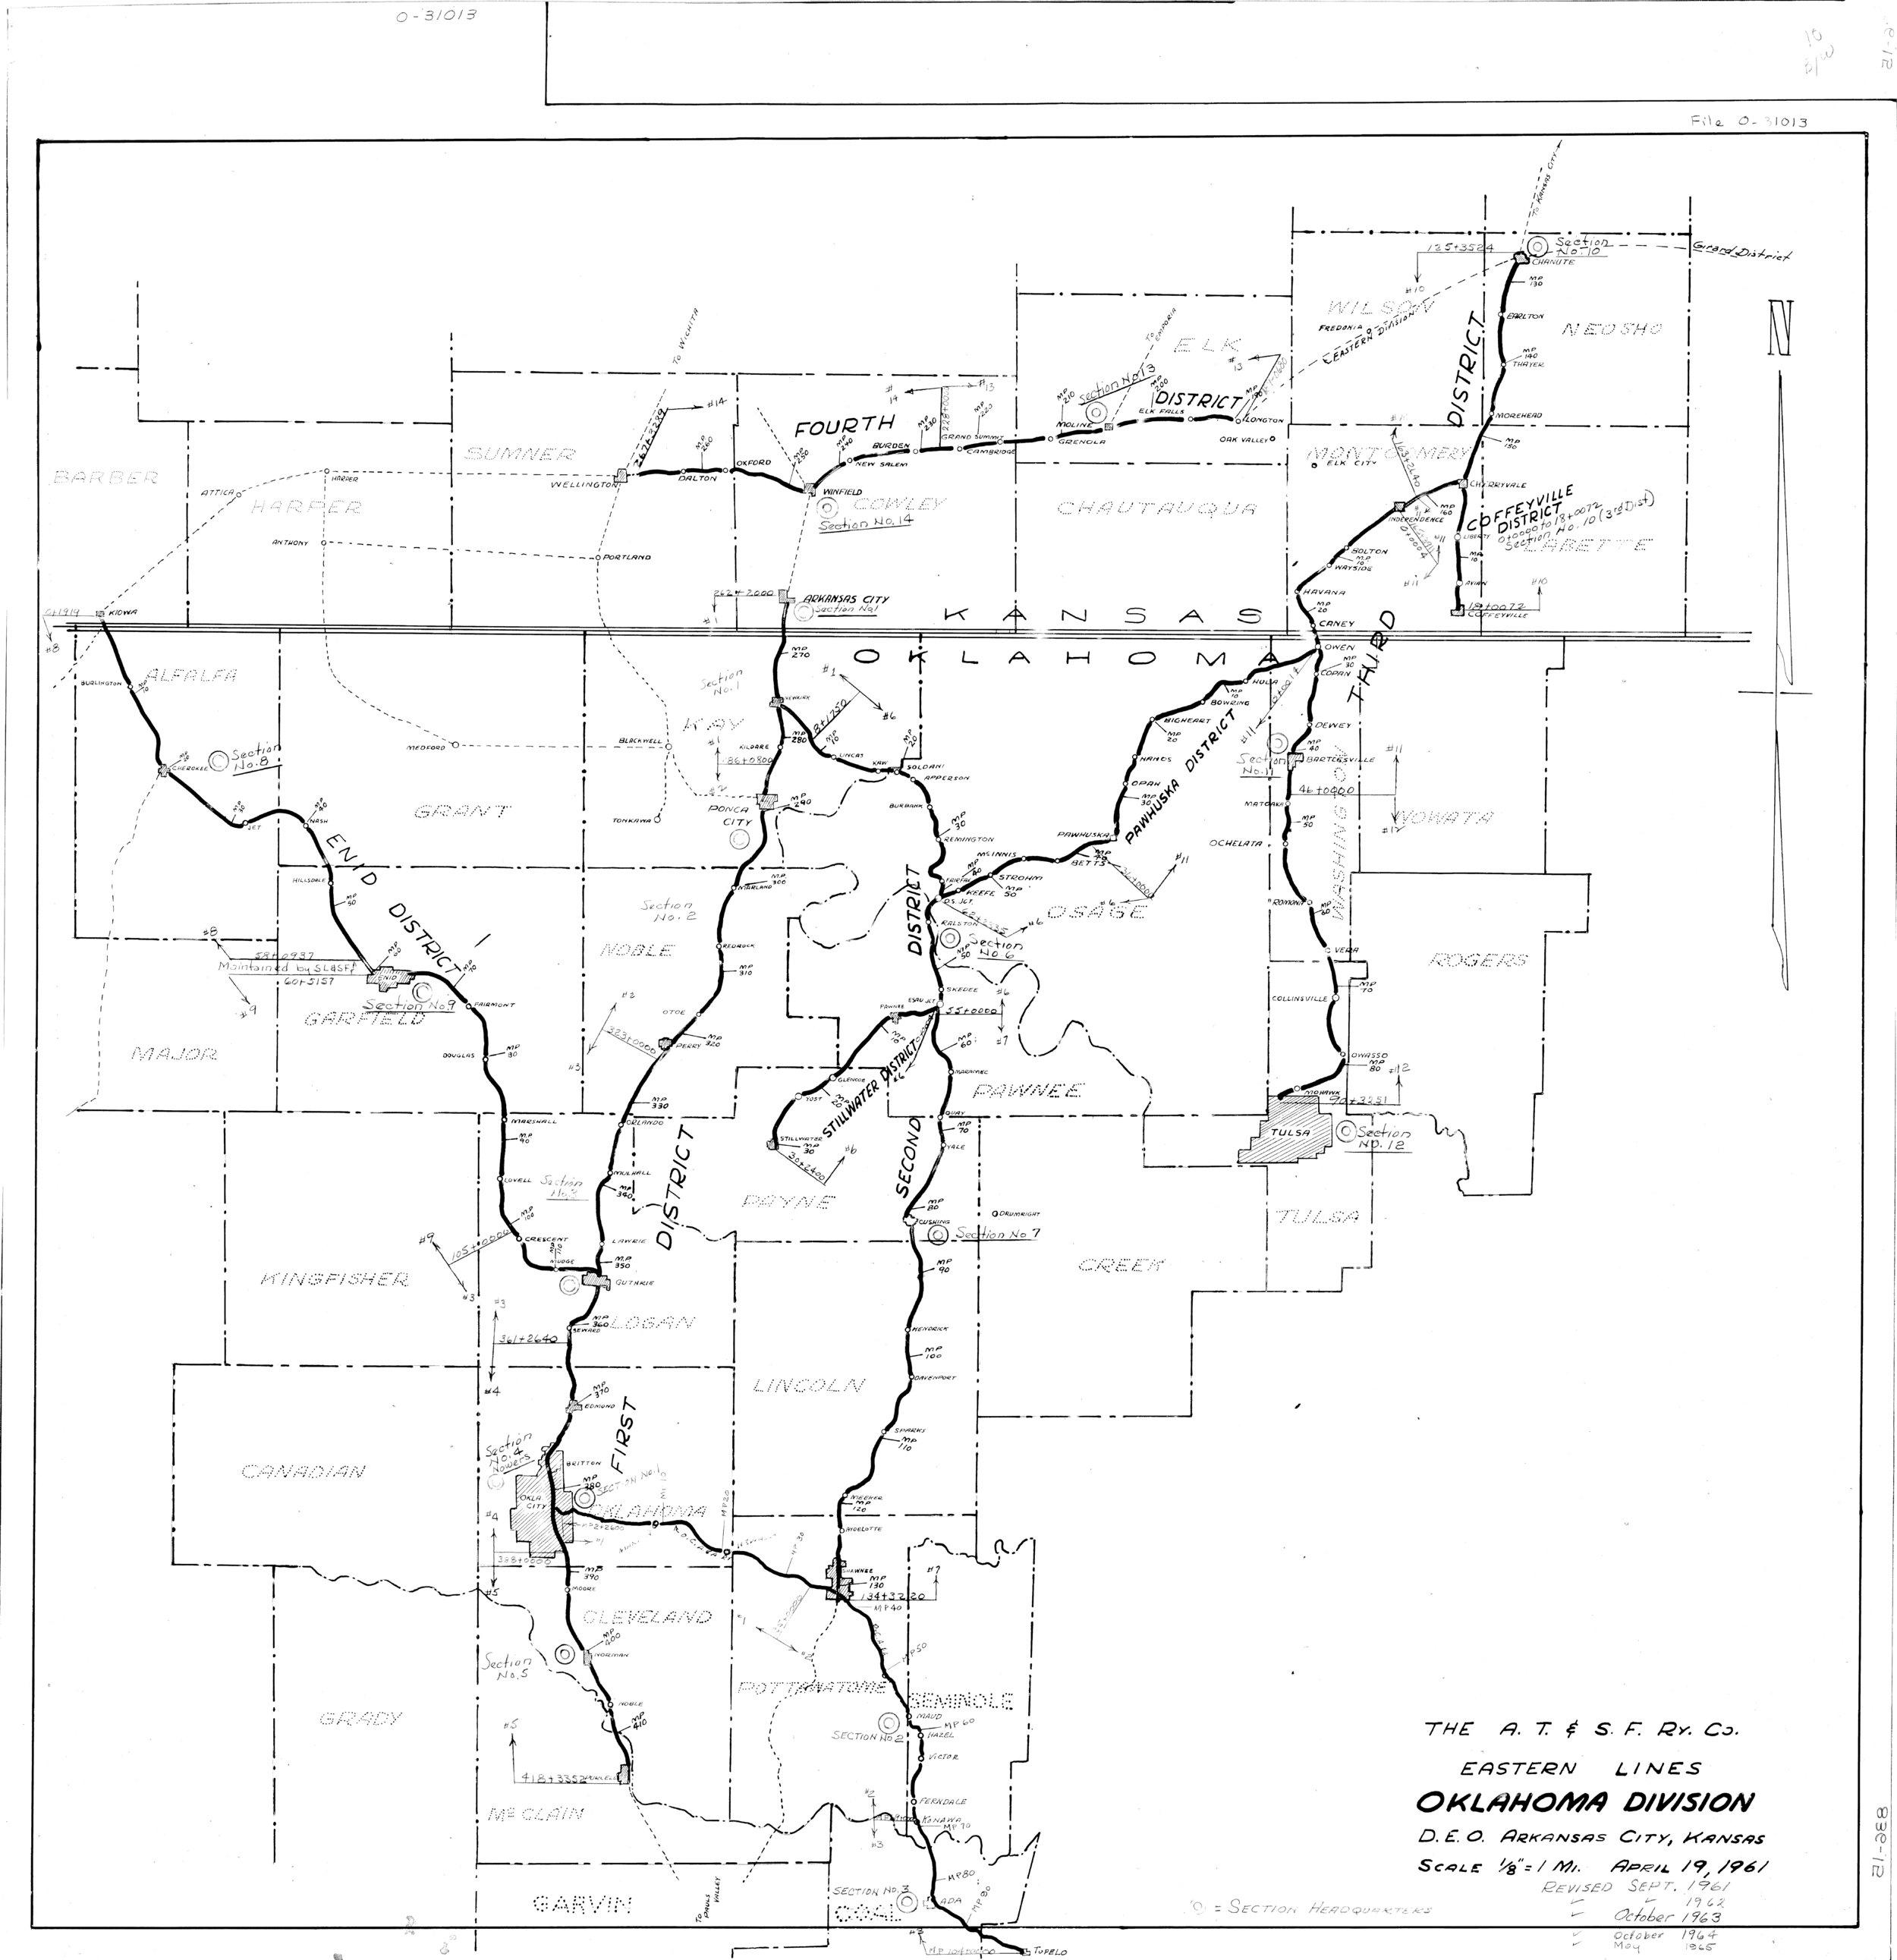 Atchison, Topeka & Santa Fe Railway Eastern Lines, Oklahoma Division